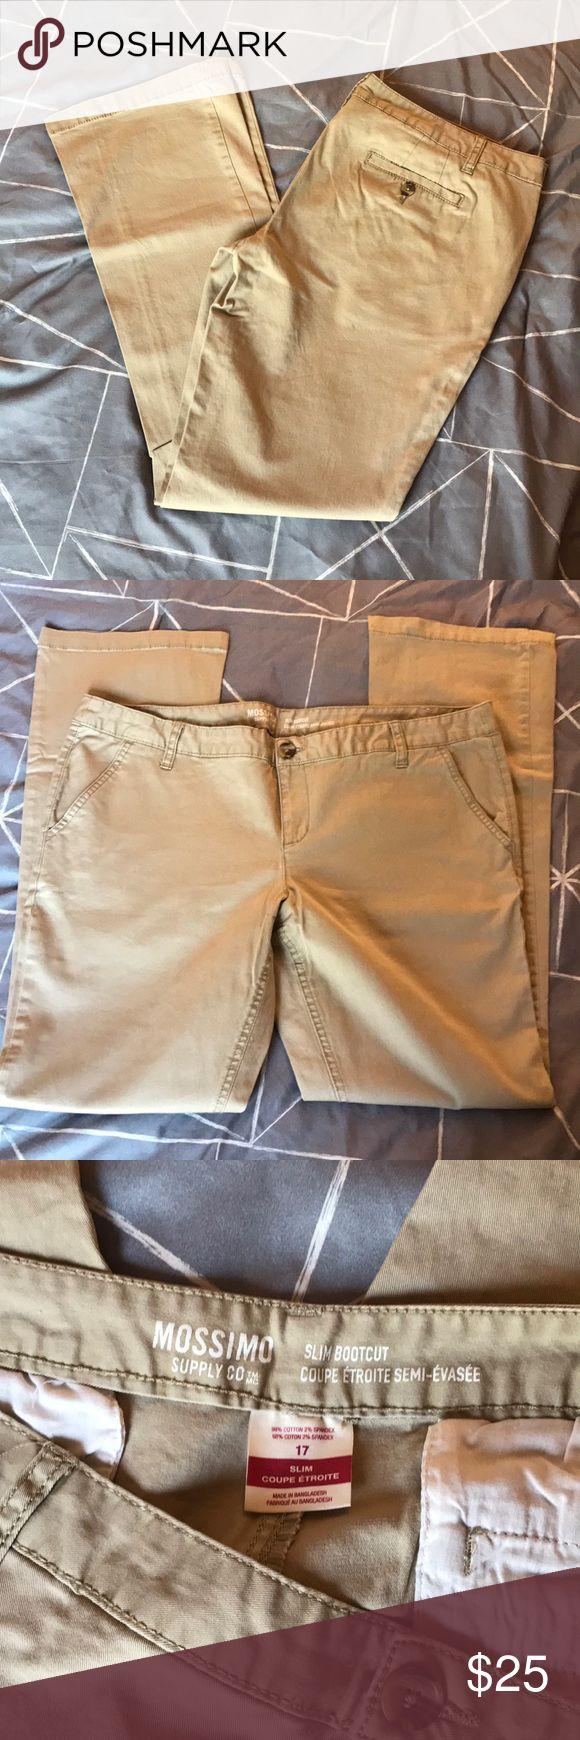 Mossimo Supply Co. Slim BootCut 17 khaki pants NWOT Mossimo Supply Co. khaki bootcut slim pants. Never worn size 17 juniors. Mossimo Supply Co Pants Boot Cut & Flare